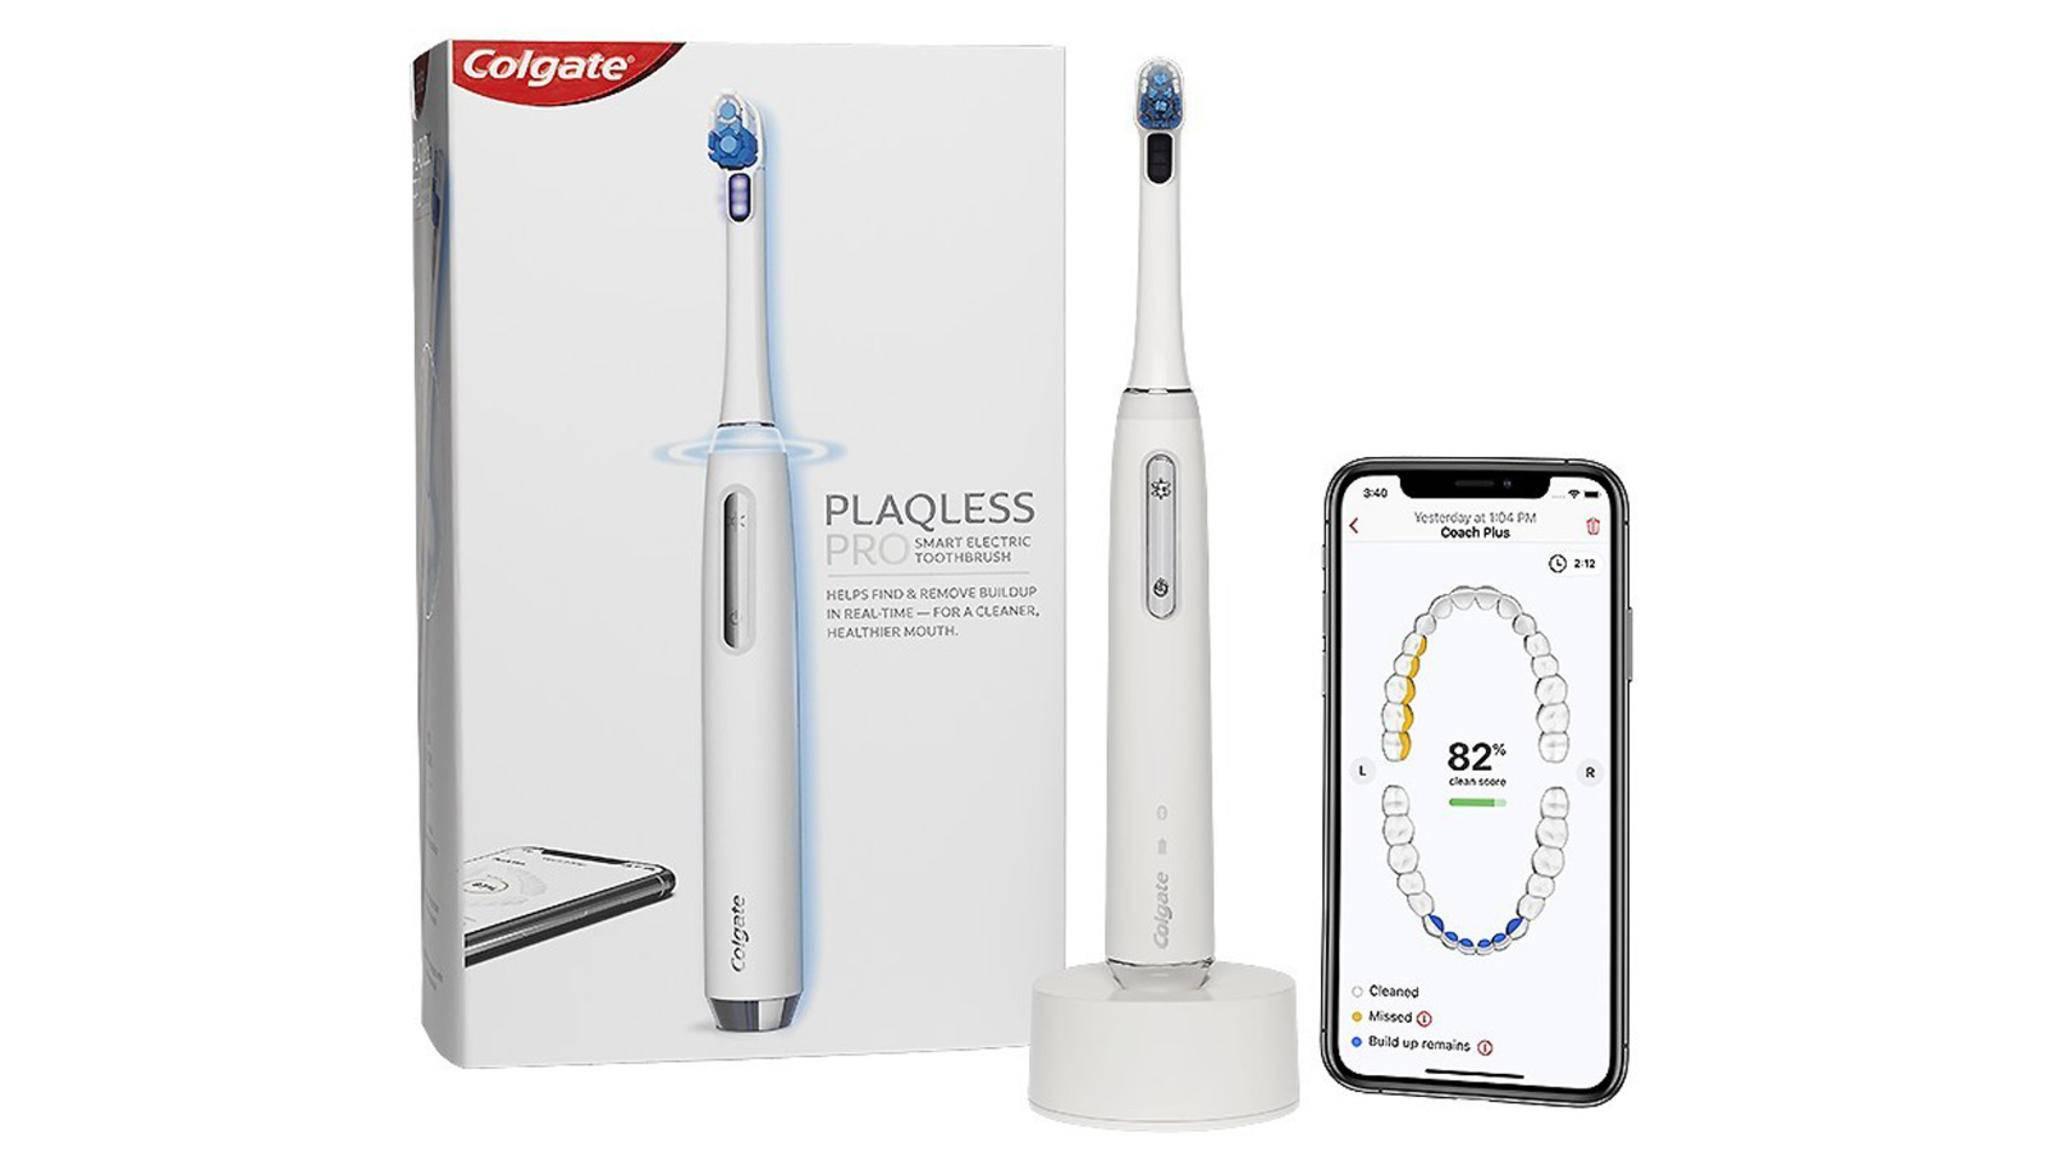 smarte Zahnbürste Colgate Plaqless Pro